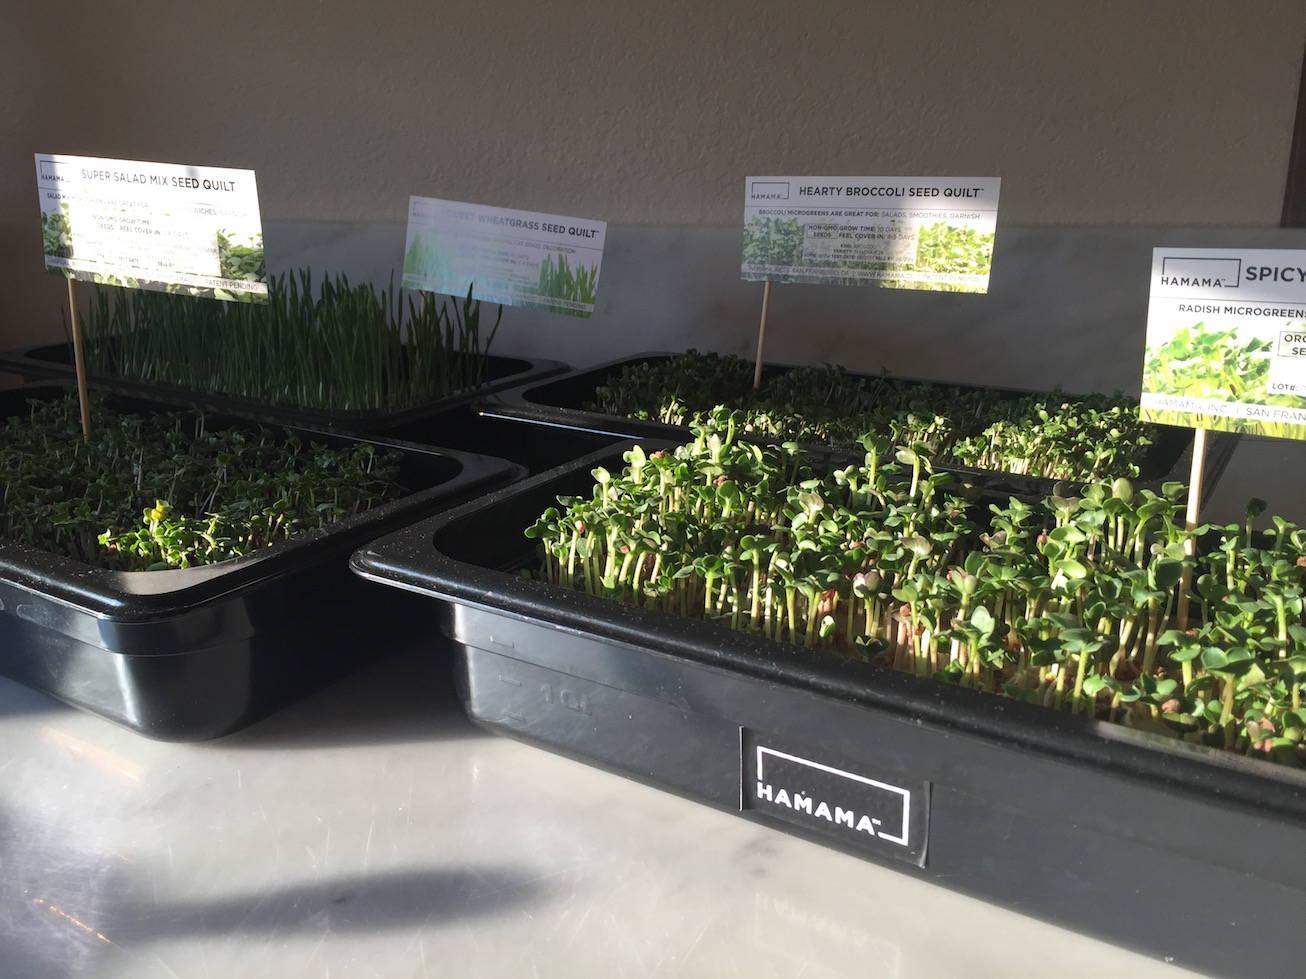 Four microgreens growing kits growing different microgreens.  Daikon radish microgreens, broccoli microgreens, wheatgrass, and salad microgreens.